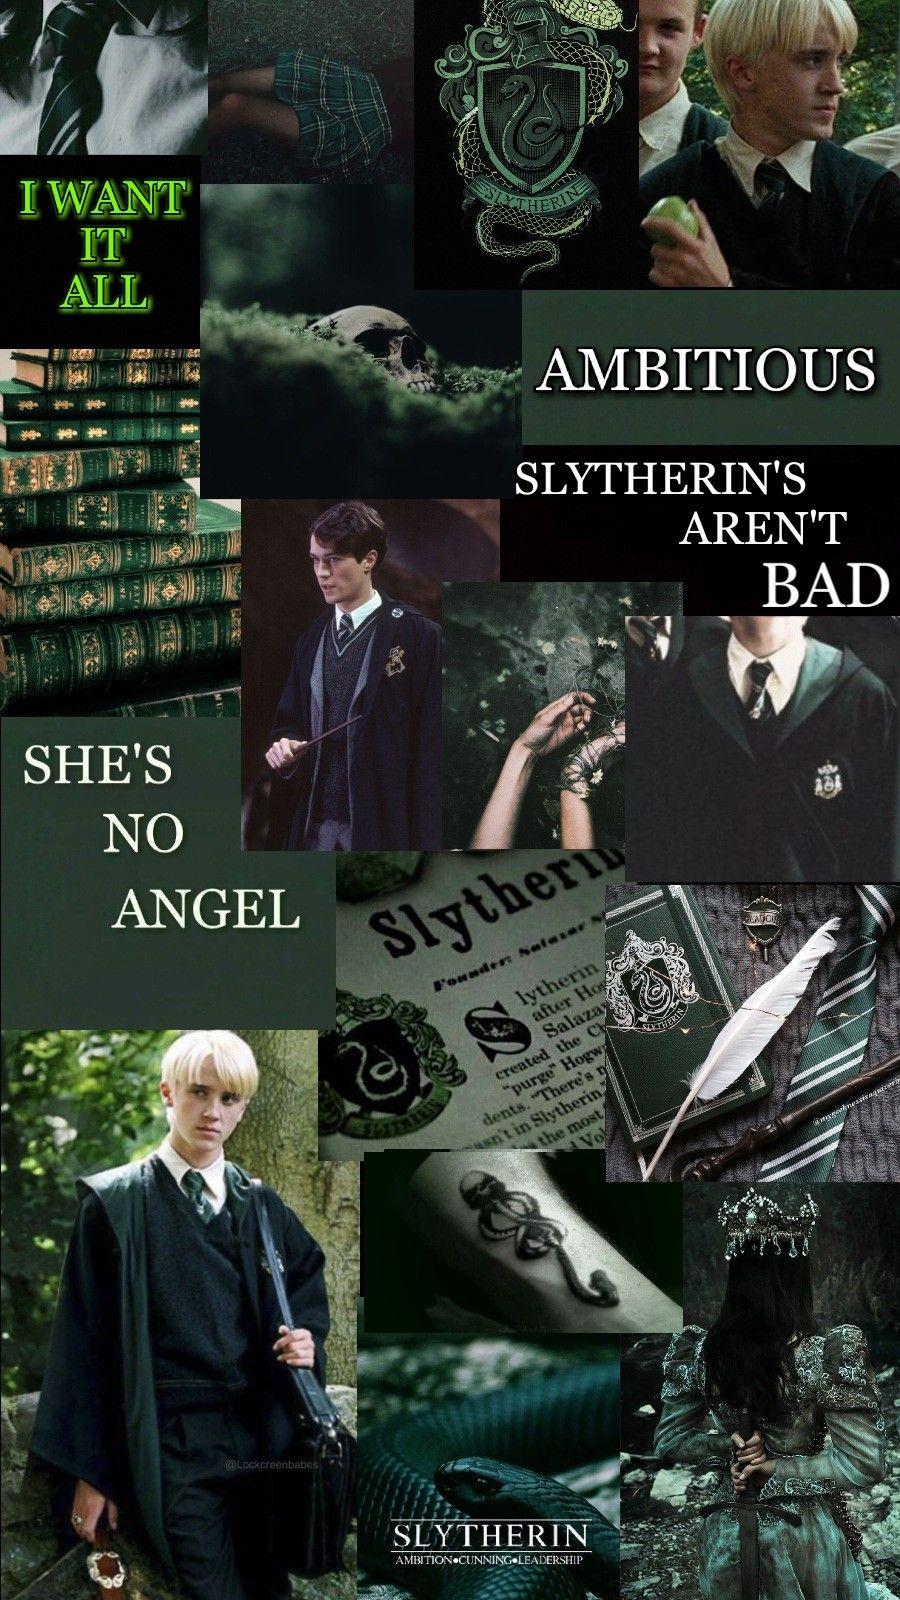 Wallpaper Slytherin Aesthetic Slytherin Slytherin Wallpaper Harry Potter Draco Malfoy